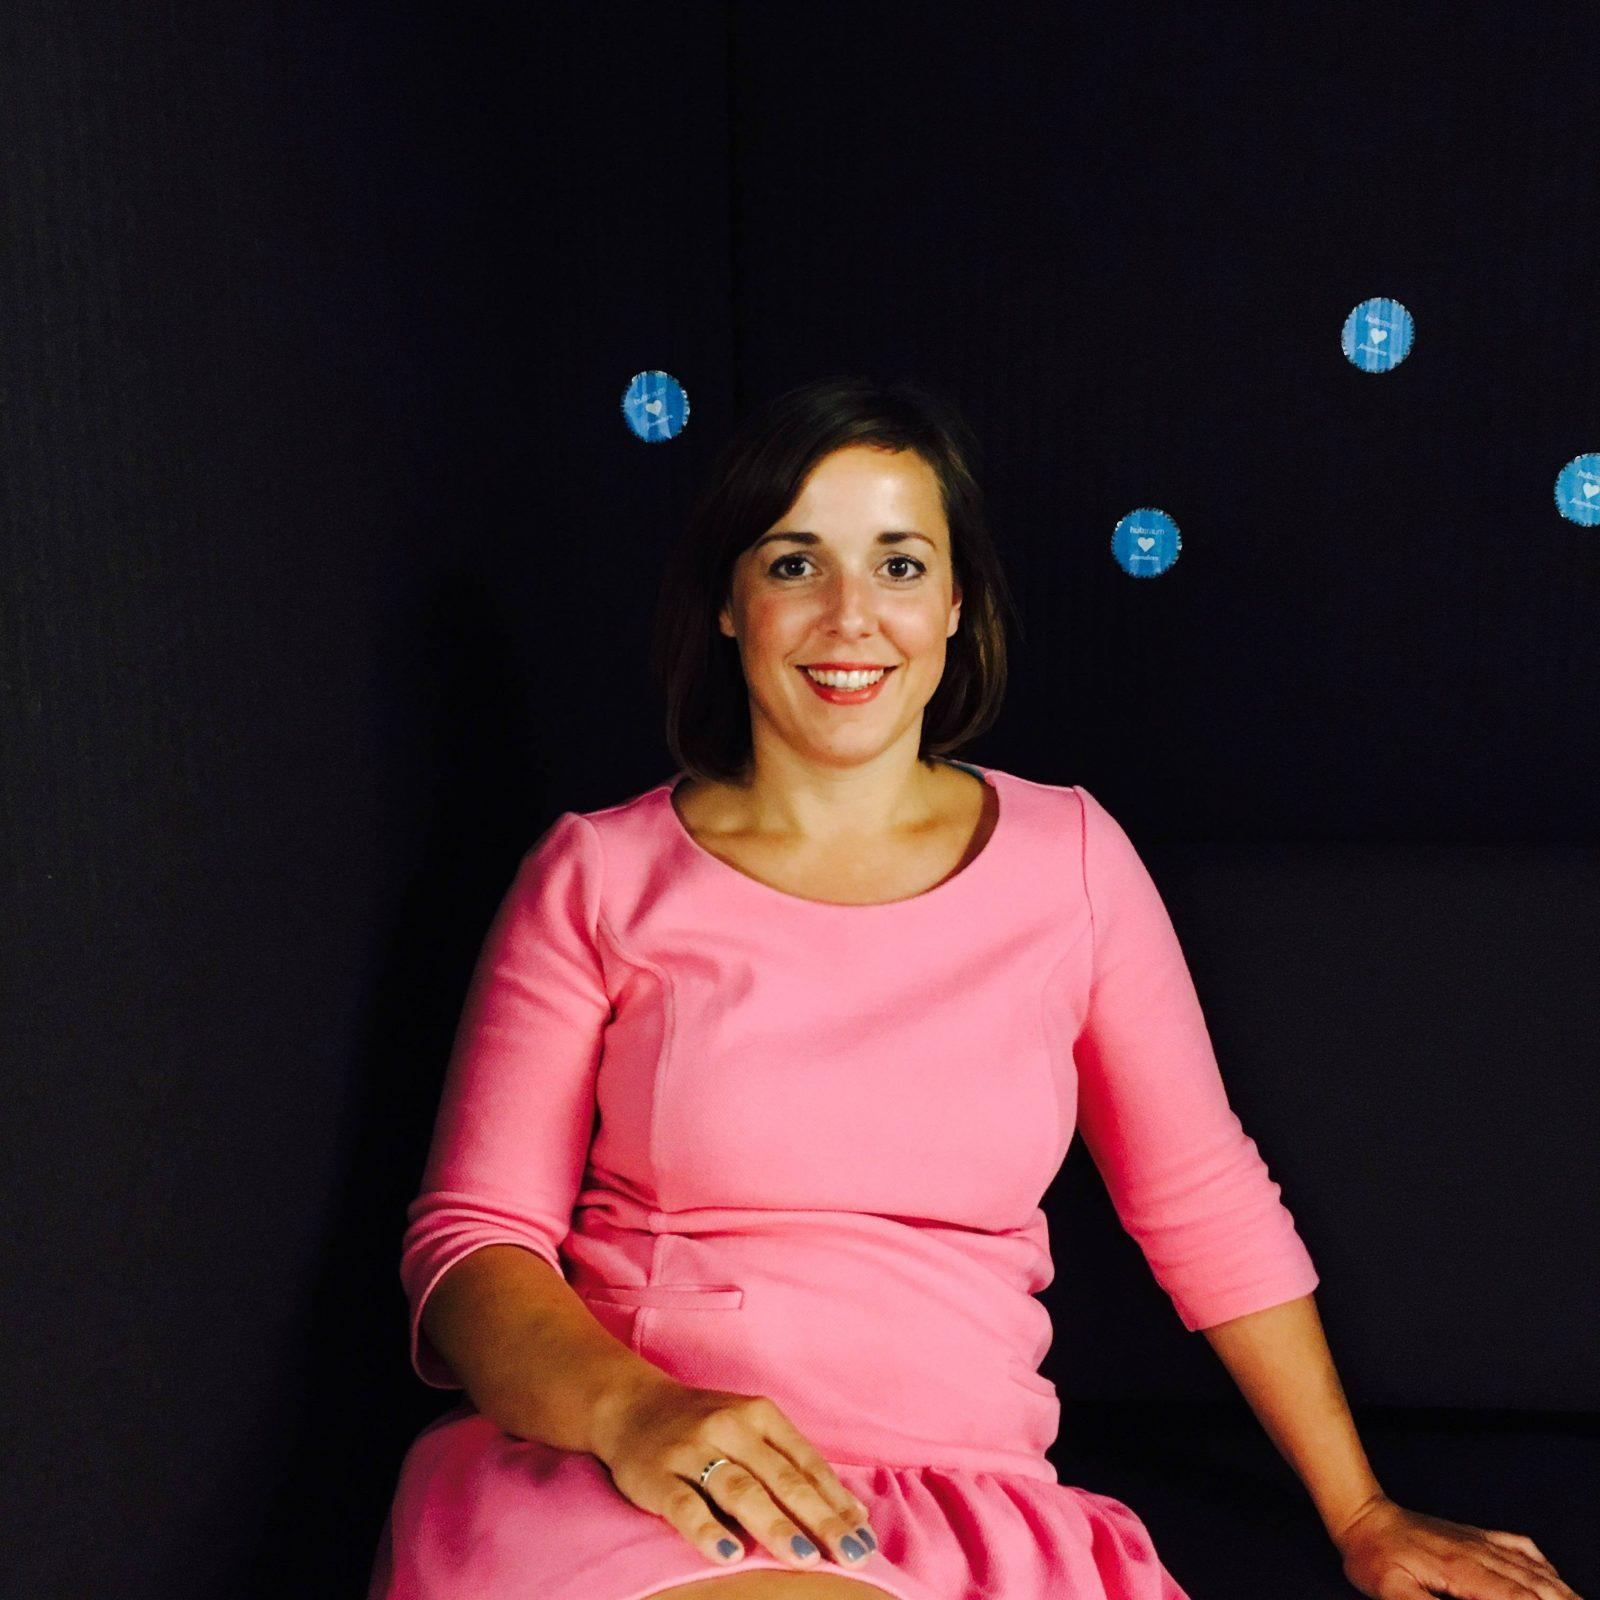 Anna Ott im Portrait